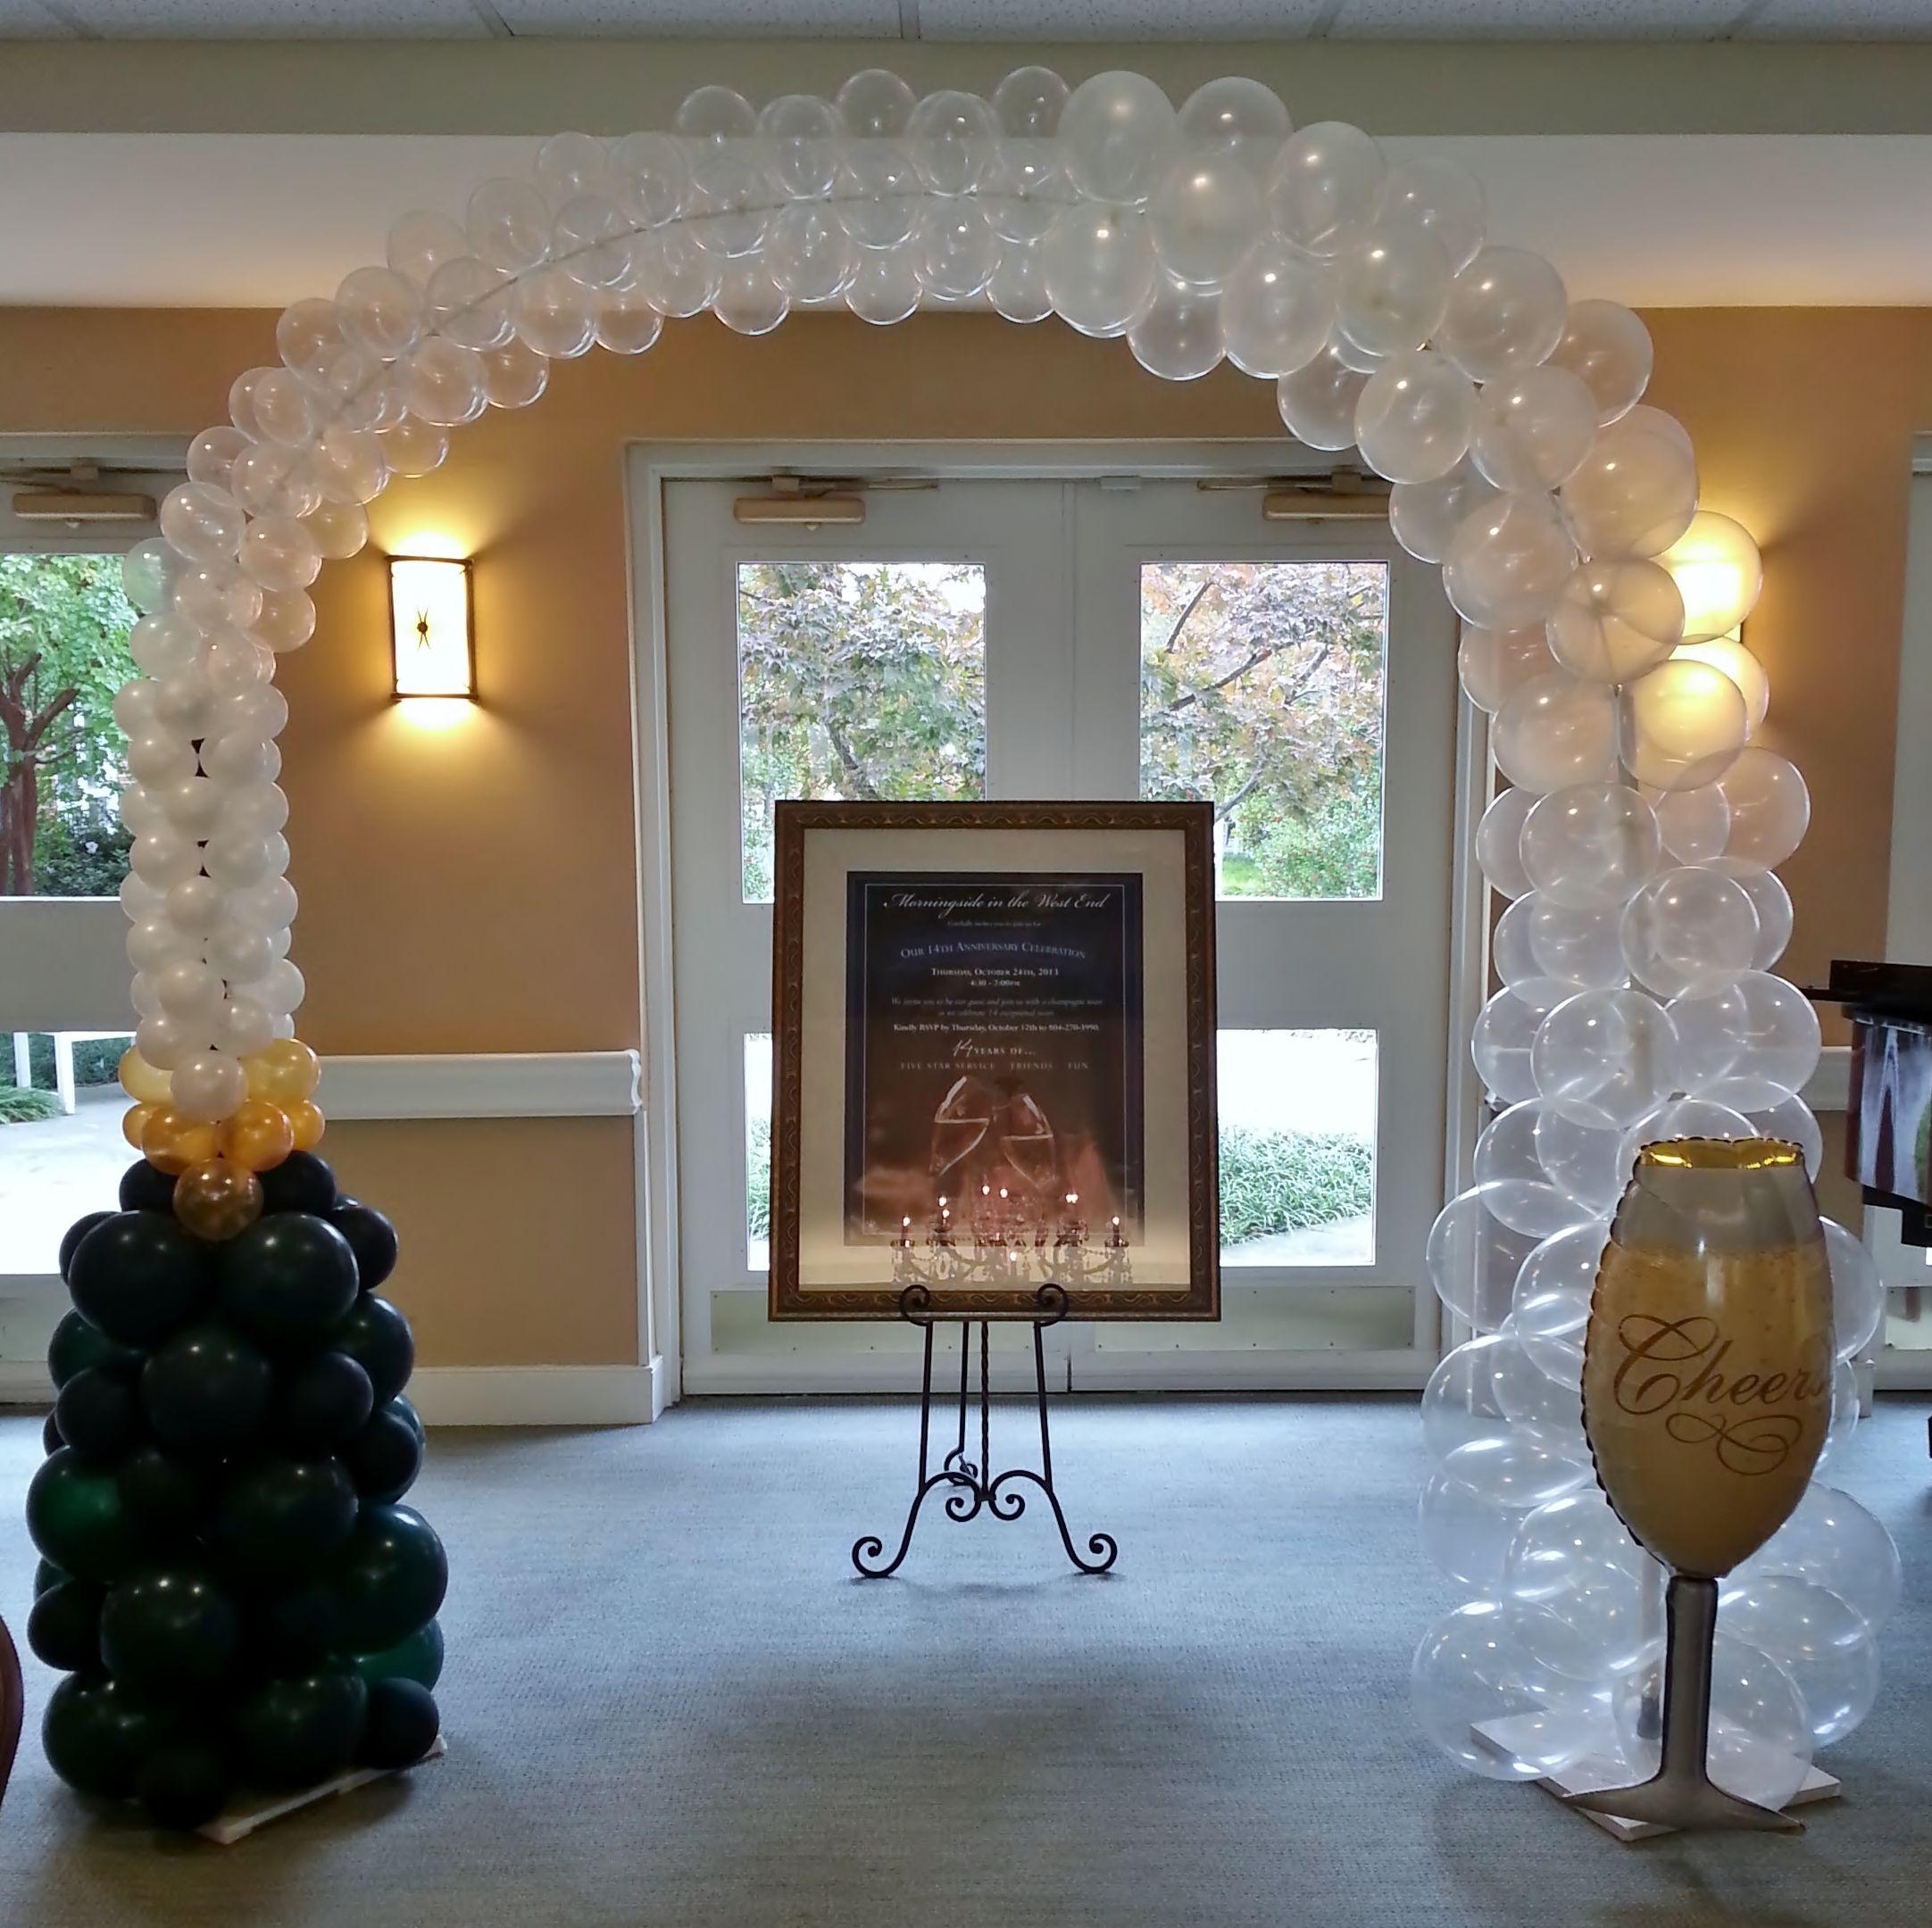 91 balloon art interior design dromik tadao cern for Champagne balloon wall